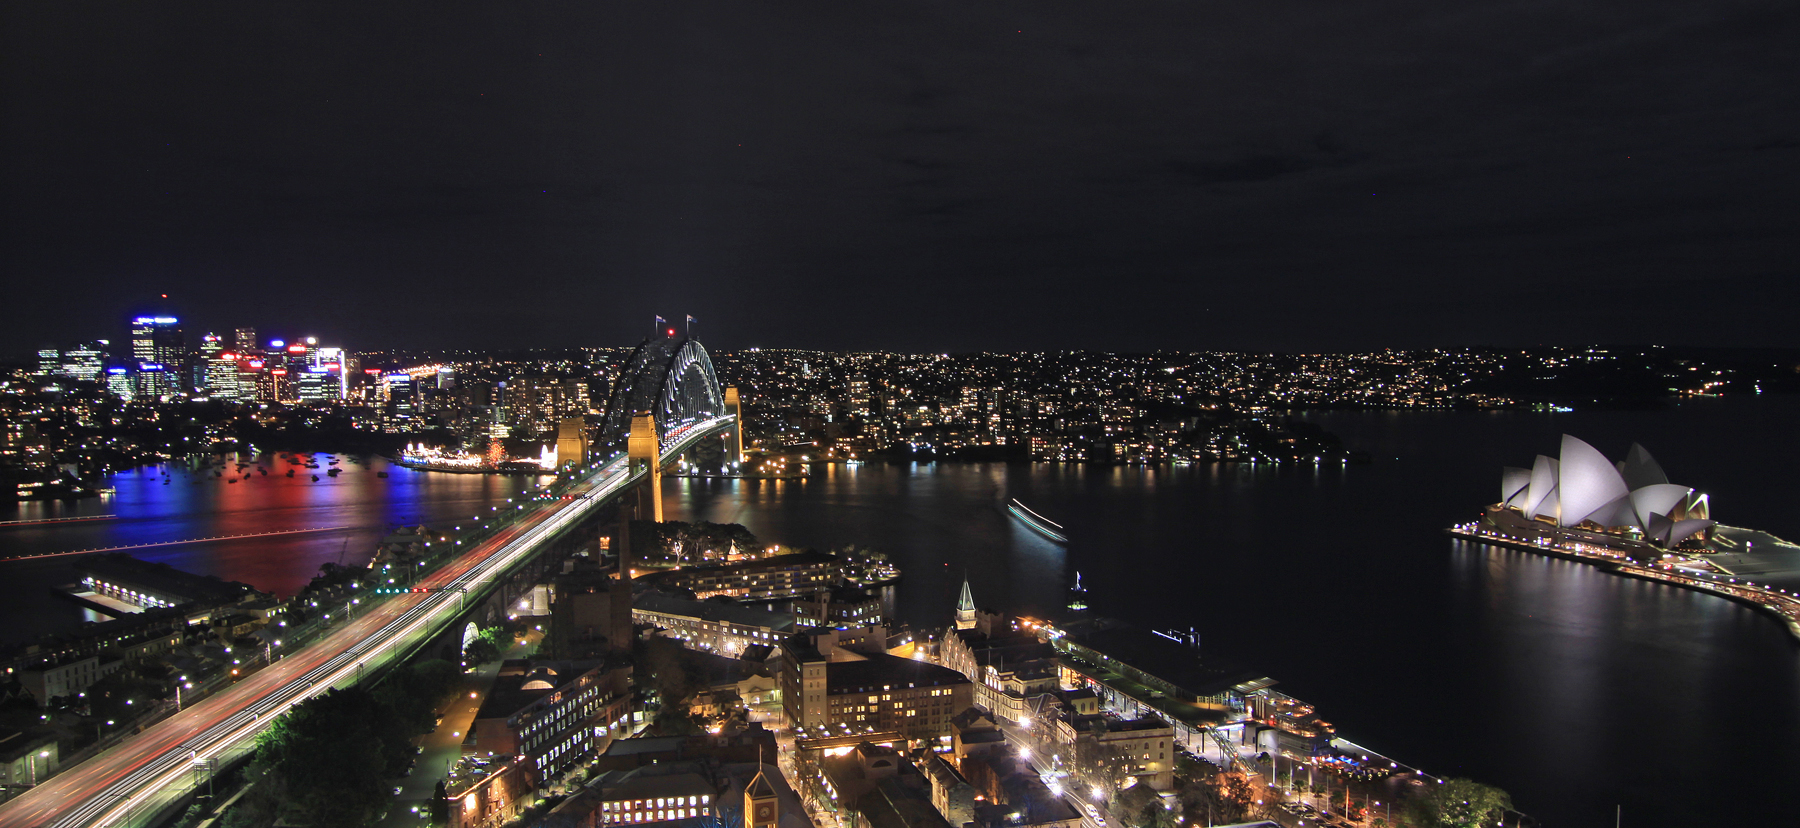 Sydney Harbour mal anders